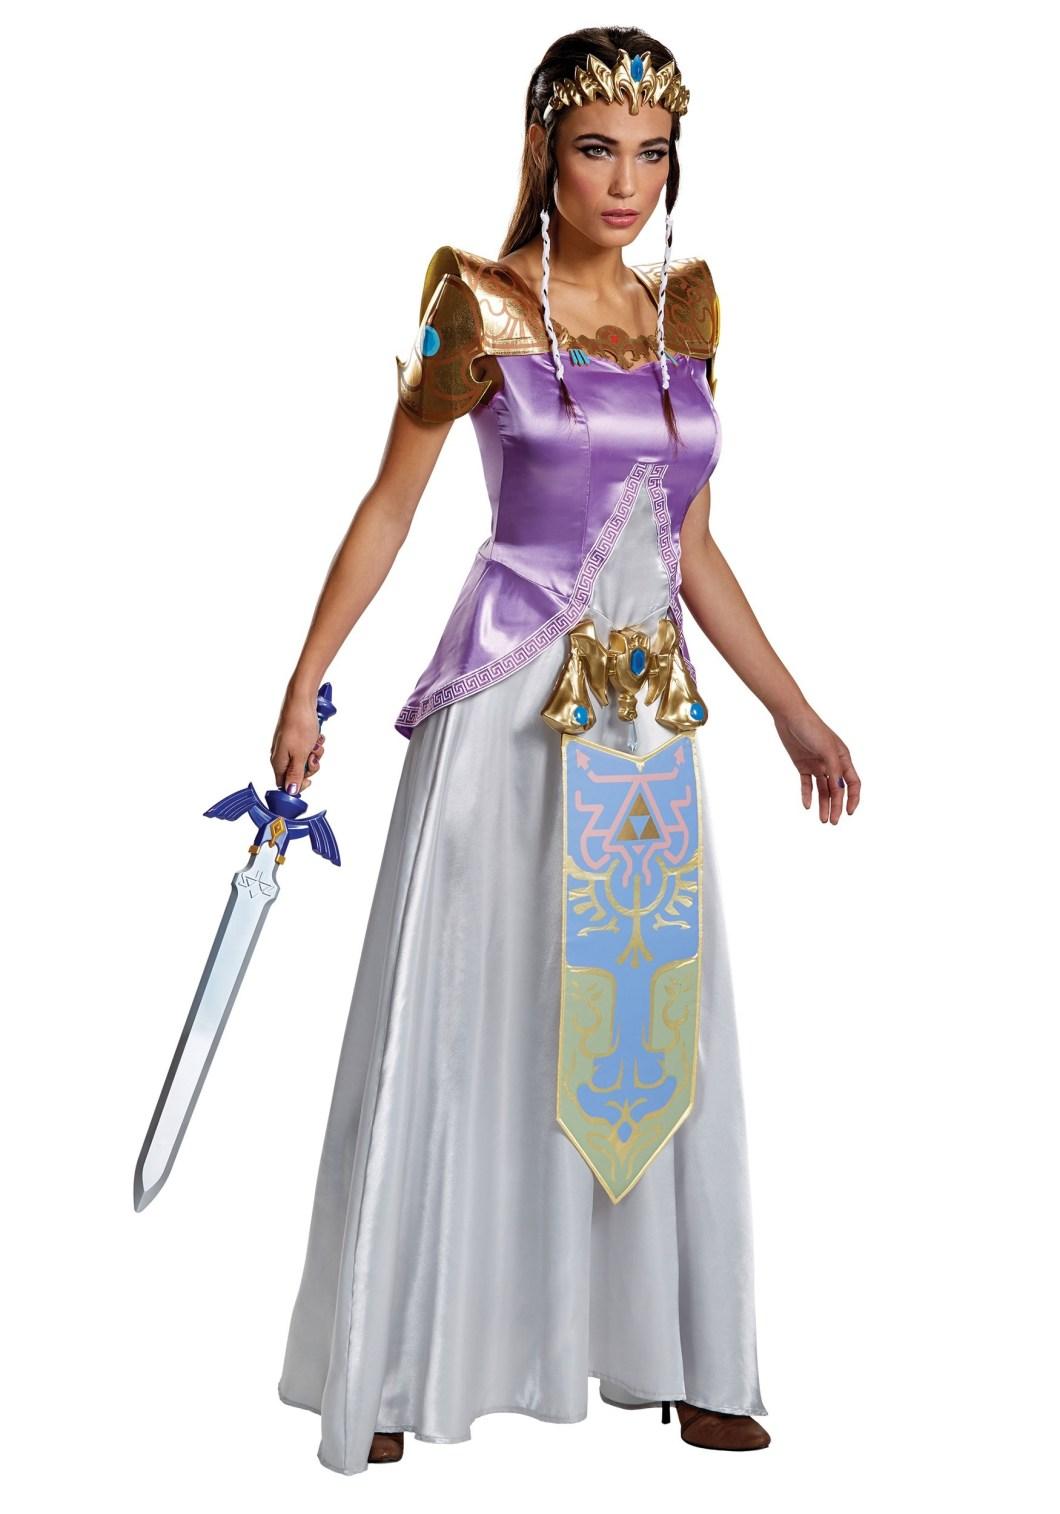 link princess zelda costumes halloweencostumes com